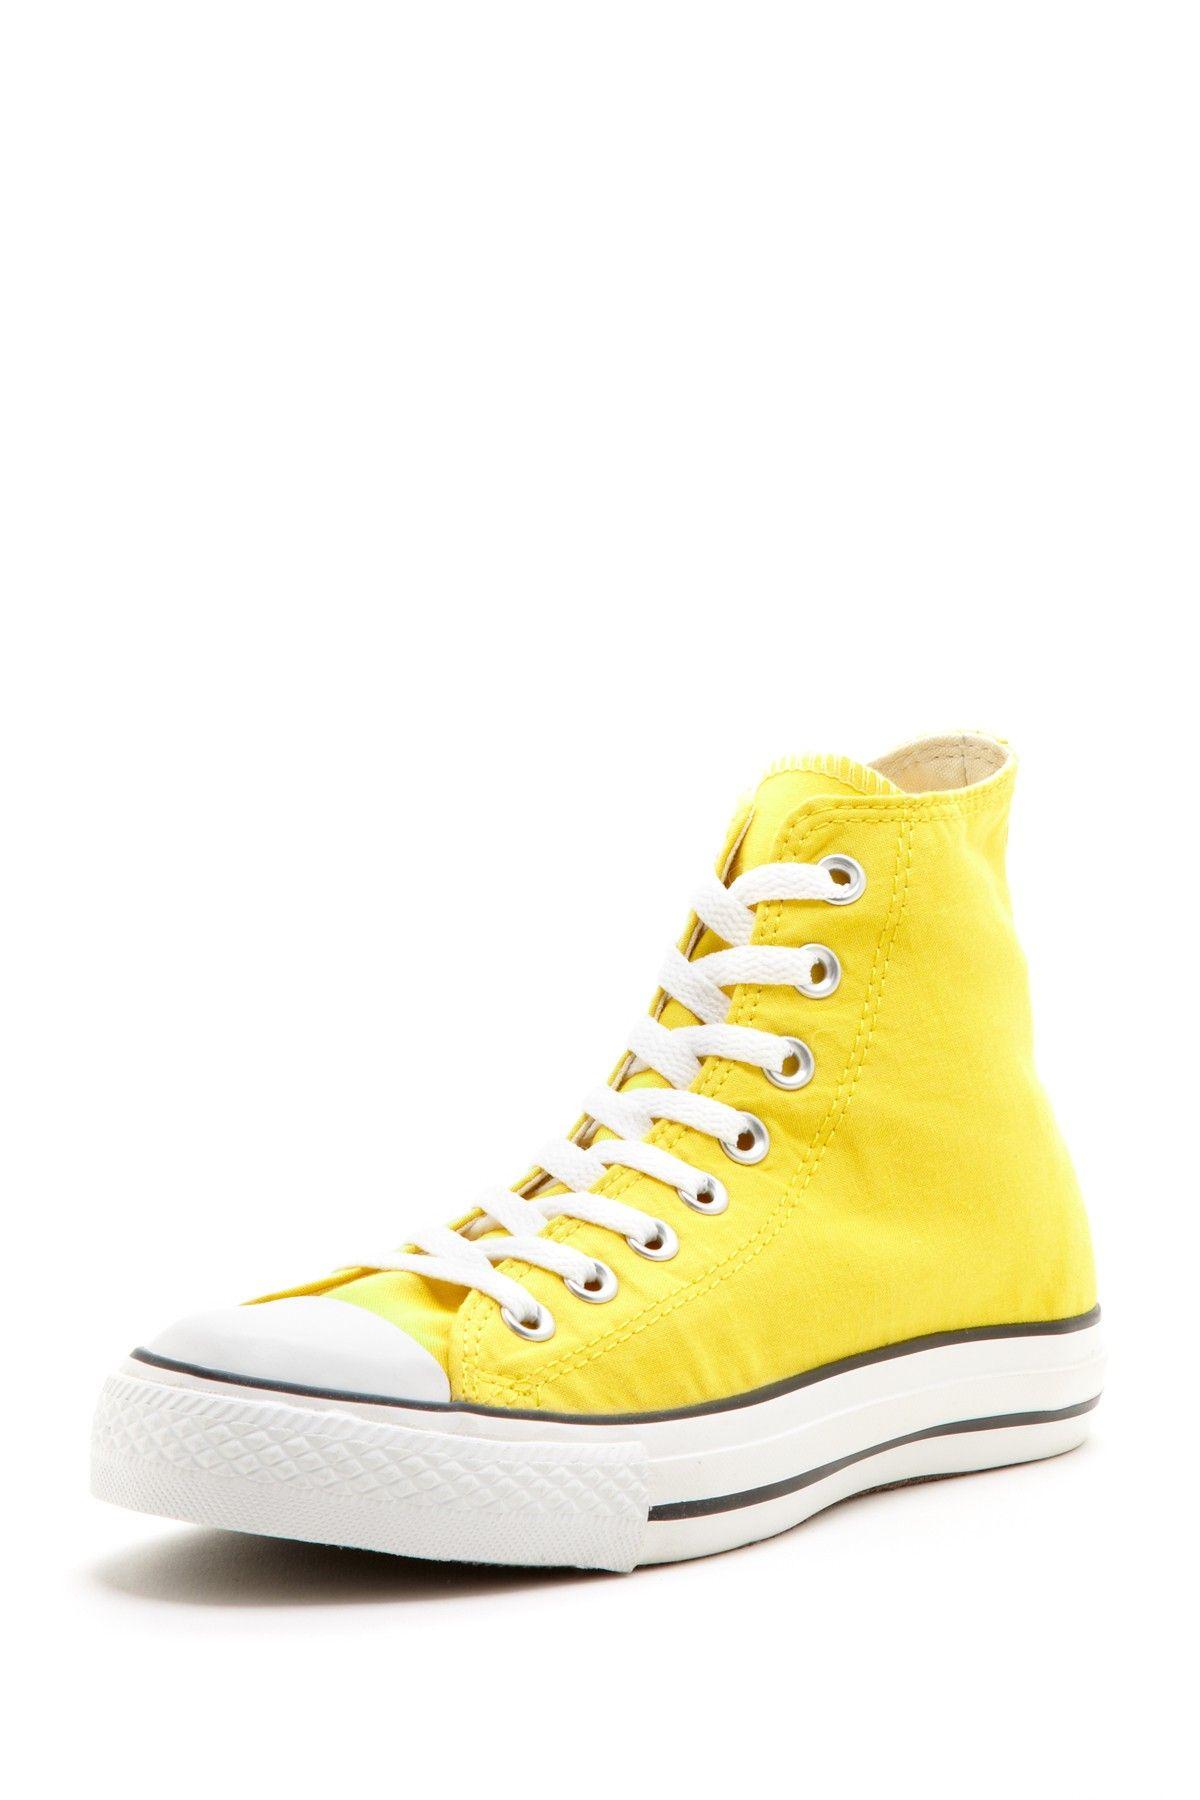 c21e8f1df622 canary yellow converse sneaker! LUV! Flats